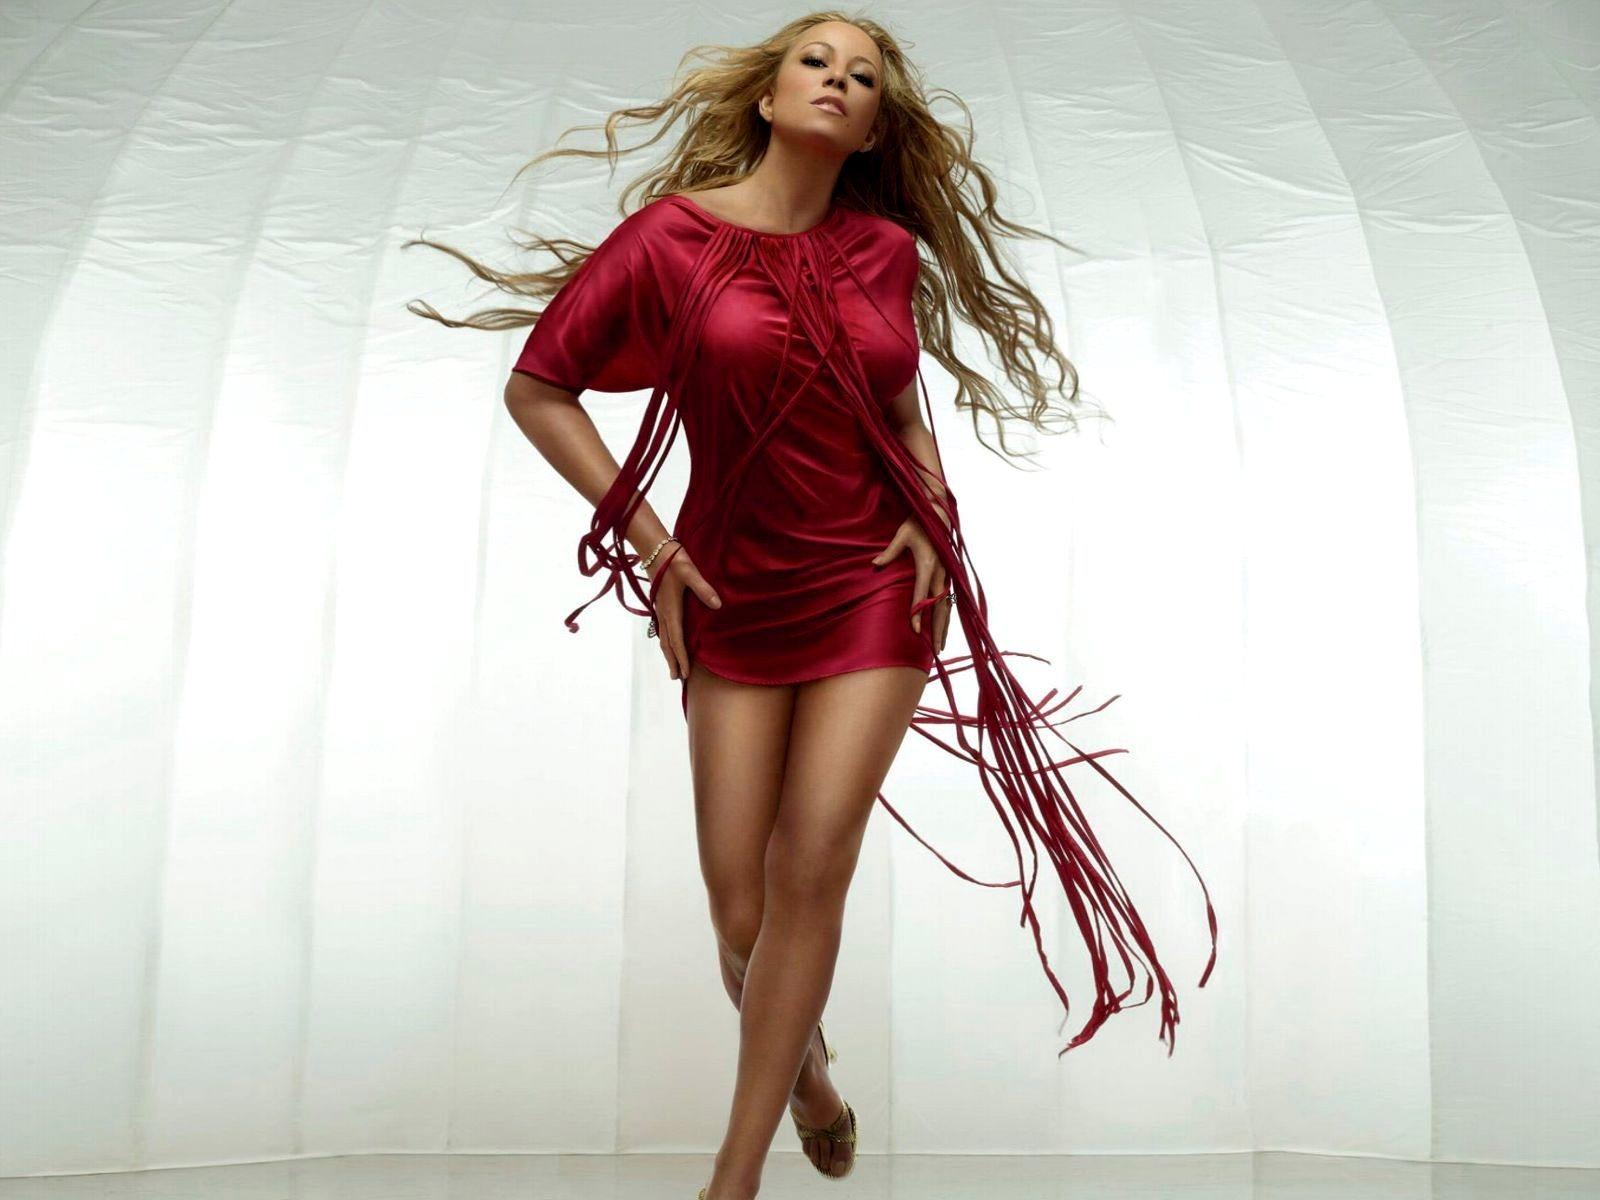 Mariah Carey New Hot HD Wallpapers 2013 | Hollywood Stars Hd ... Emmy Rossum Wallpaper